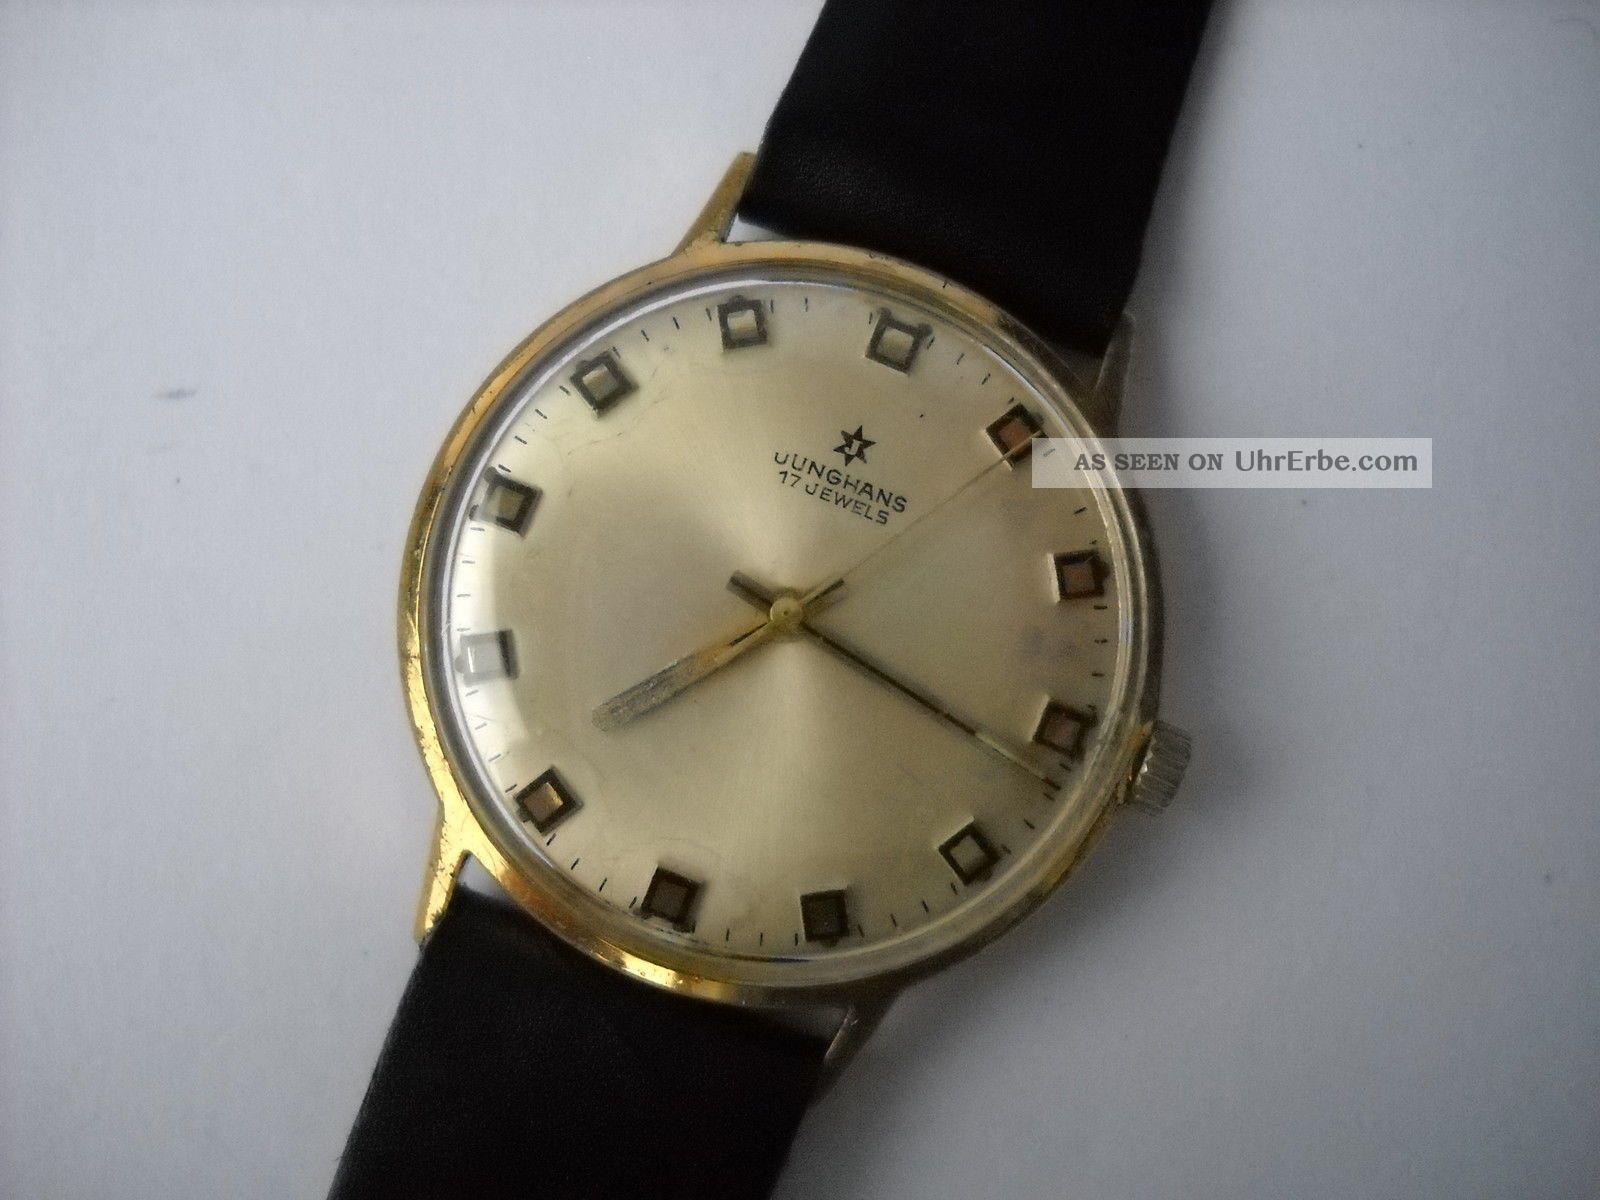 Junghans,  Herren,  Armbanduhr,  Handaufzug,  Vergoldet,  Kaliber 620.  00 Armbanduhren Bild